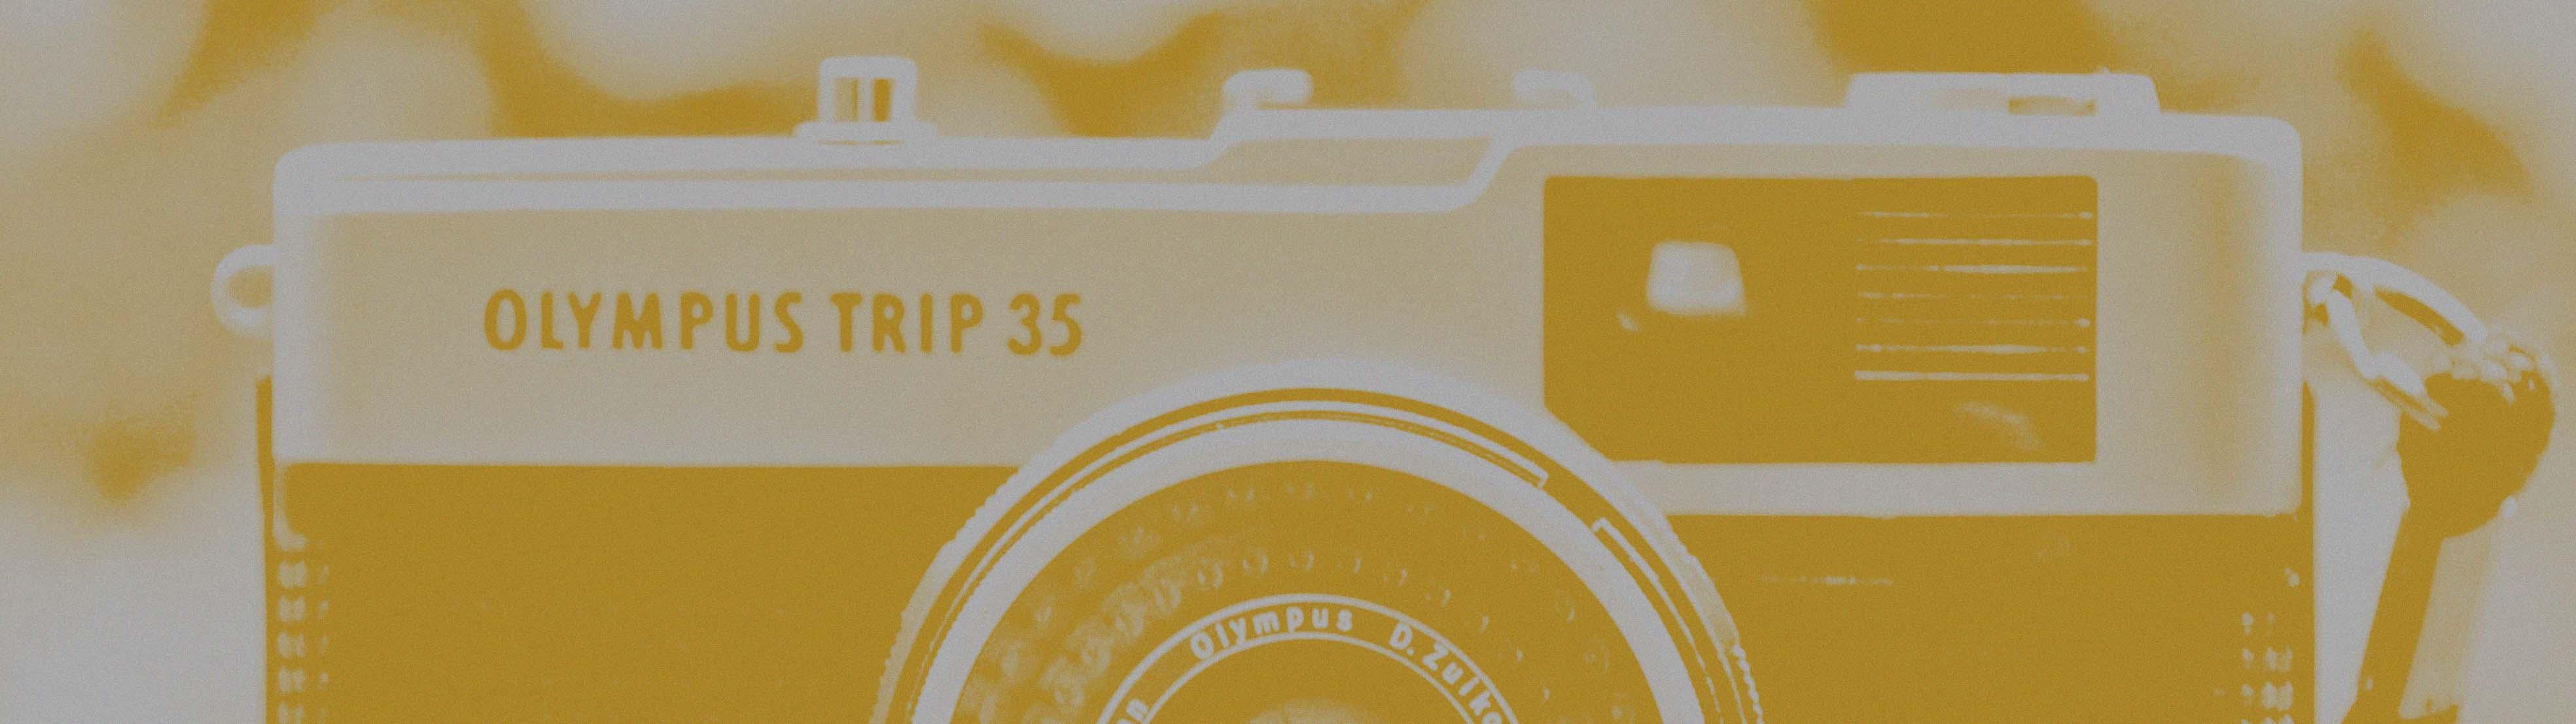 Detalle cámara fotográfica antigua